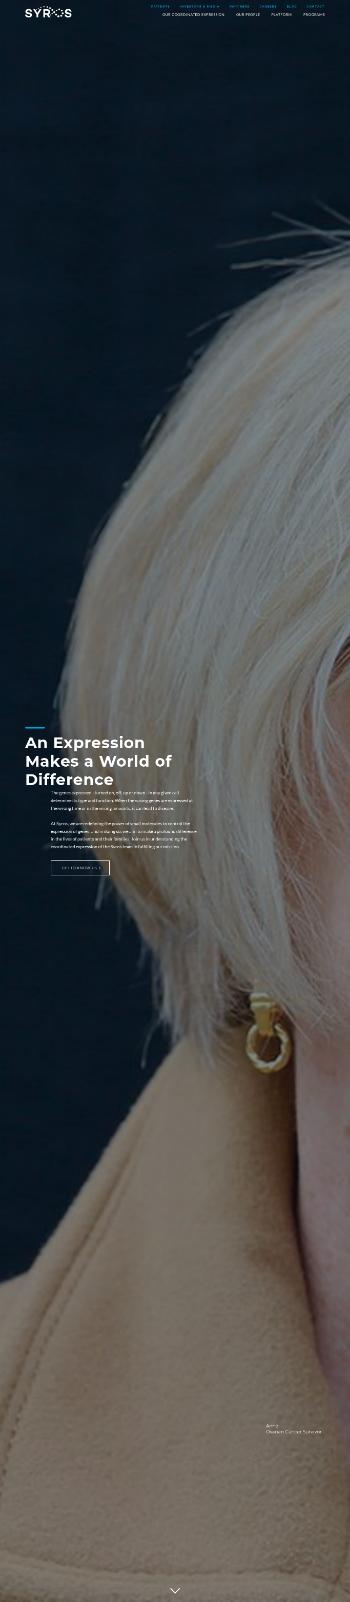 Syros Pharmaceuticals, Inc. Website Screenshot